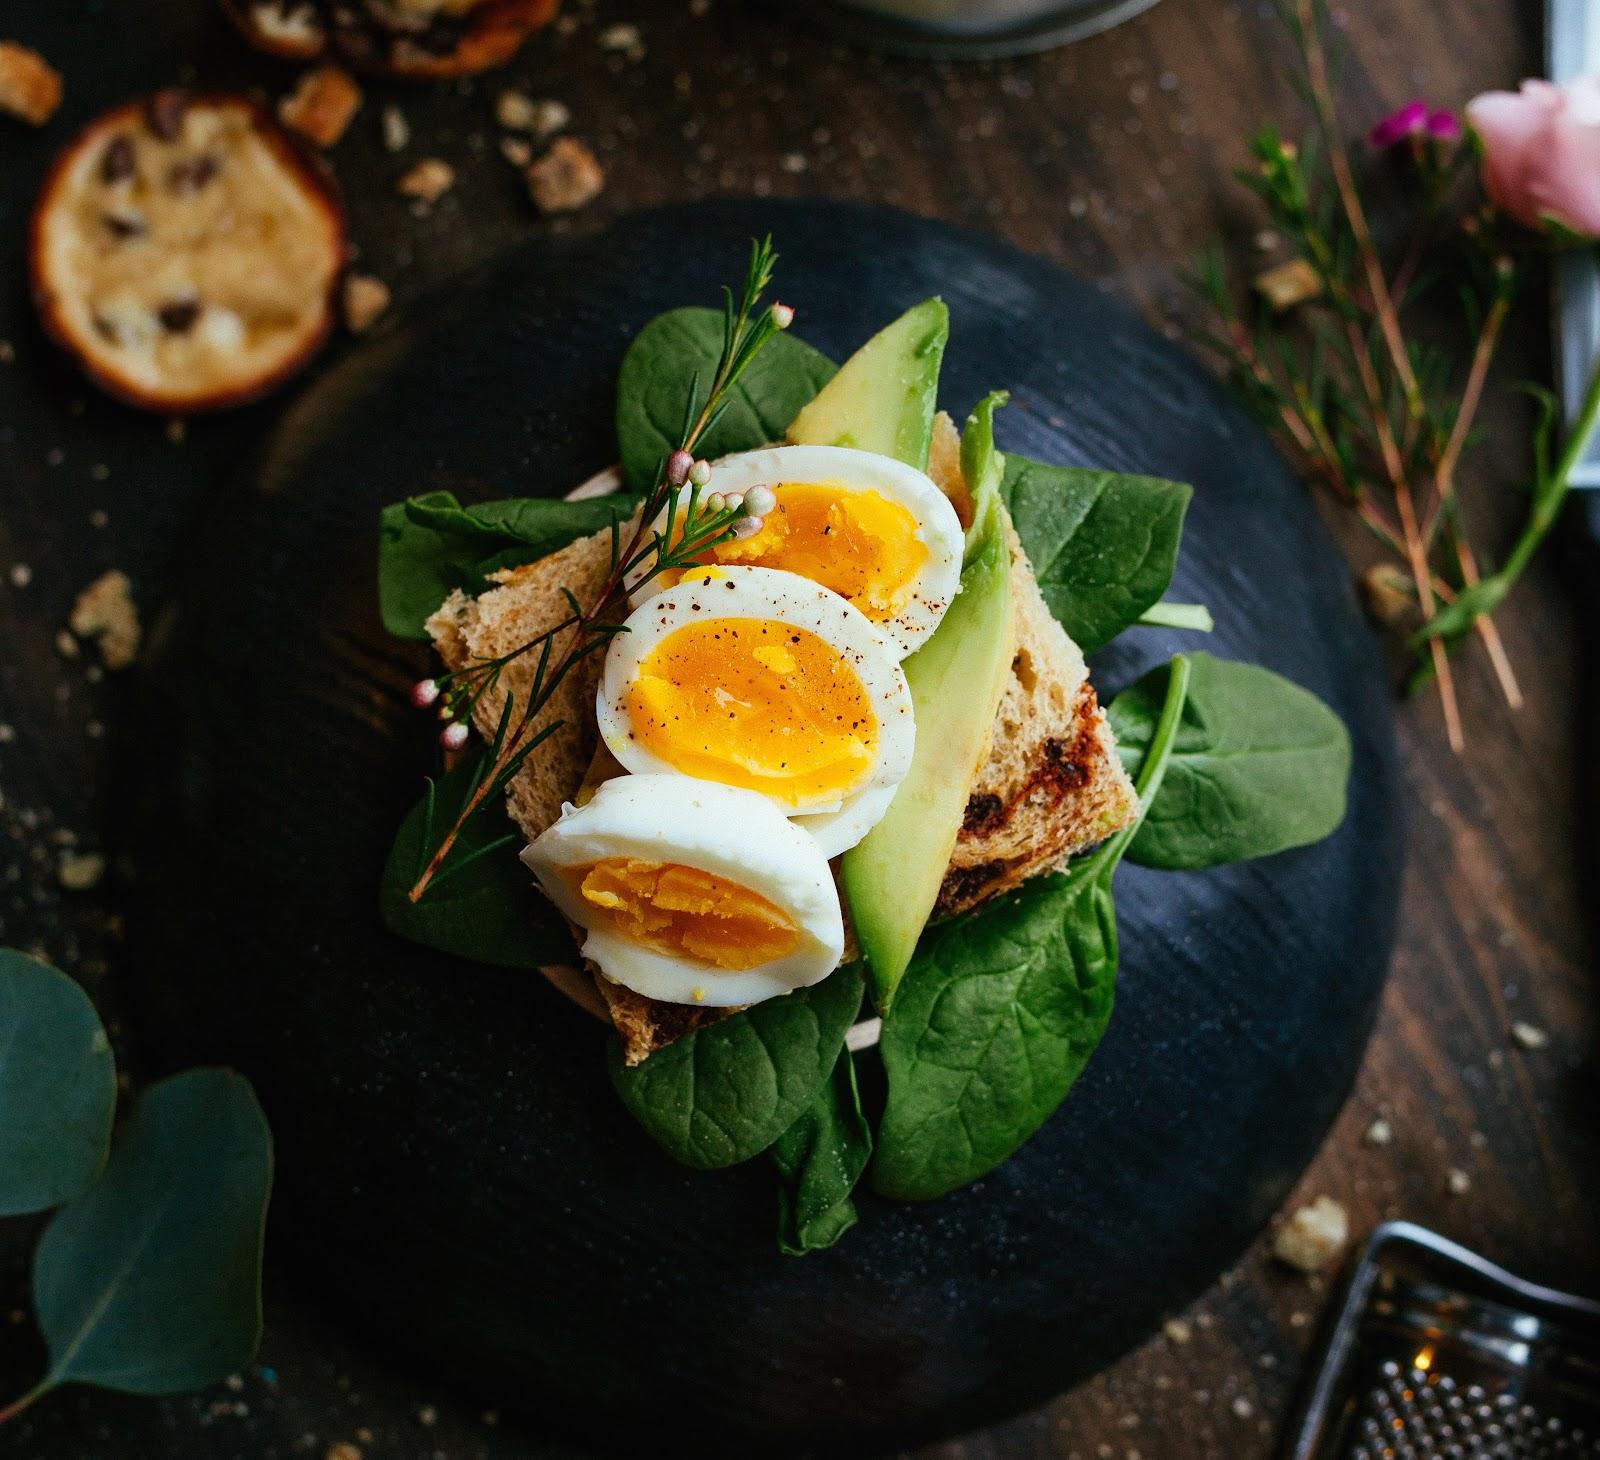 Sliced boiled egg on avocado toast.